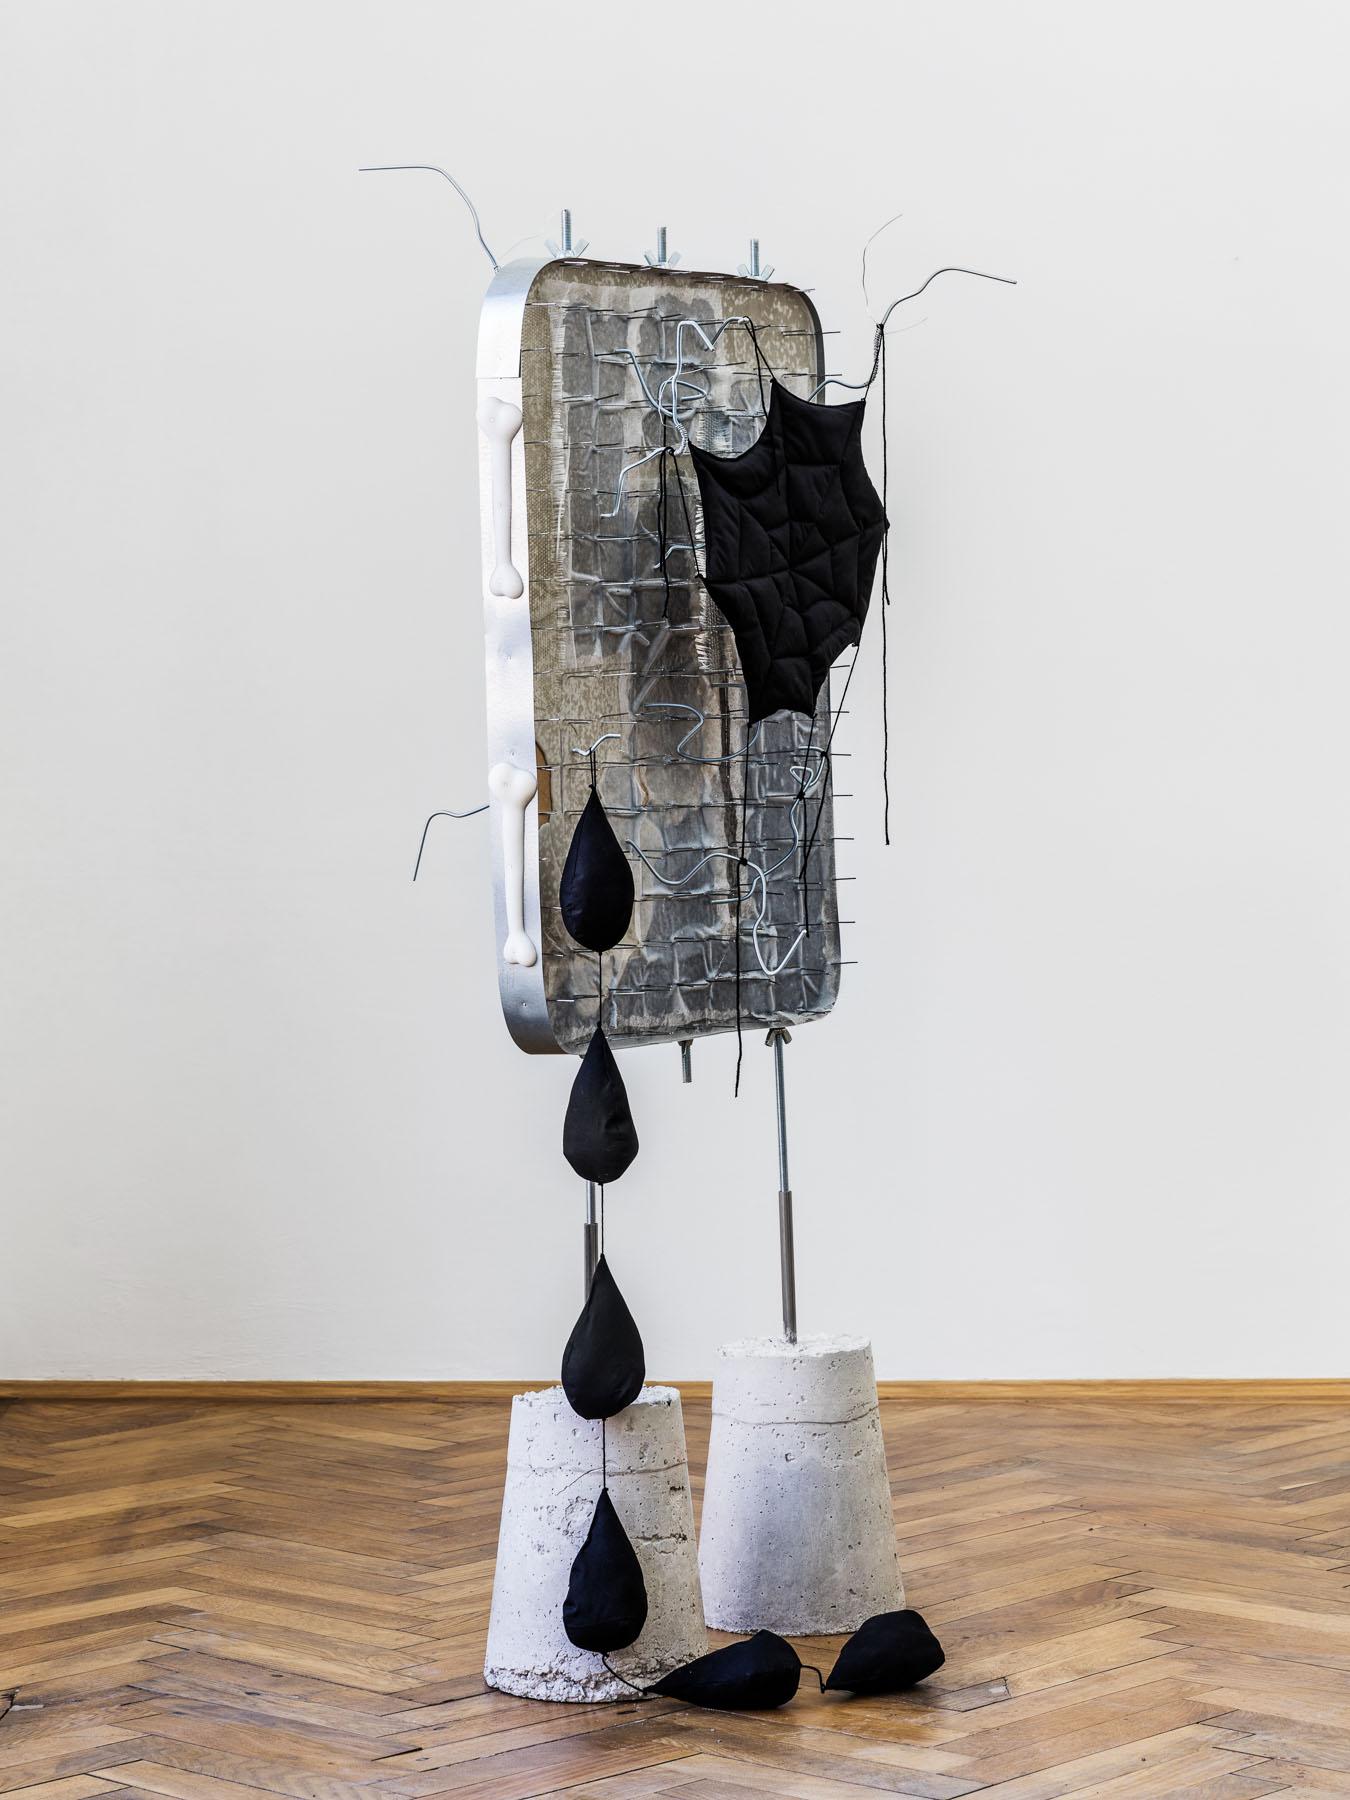 Stefan Fuchs, Abandoned space. Wifi stays, 2017, Mixed media, 171 x 73 x 62 cm